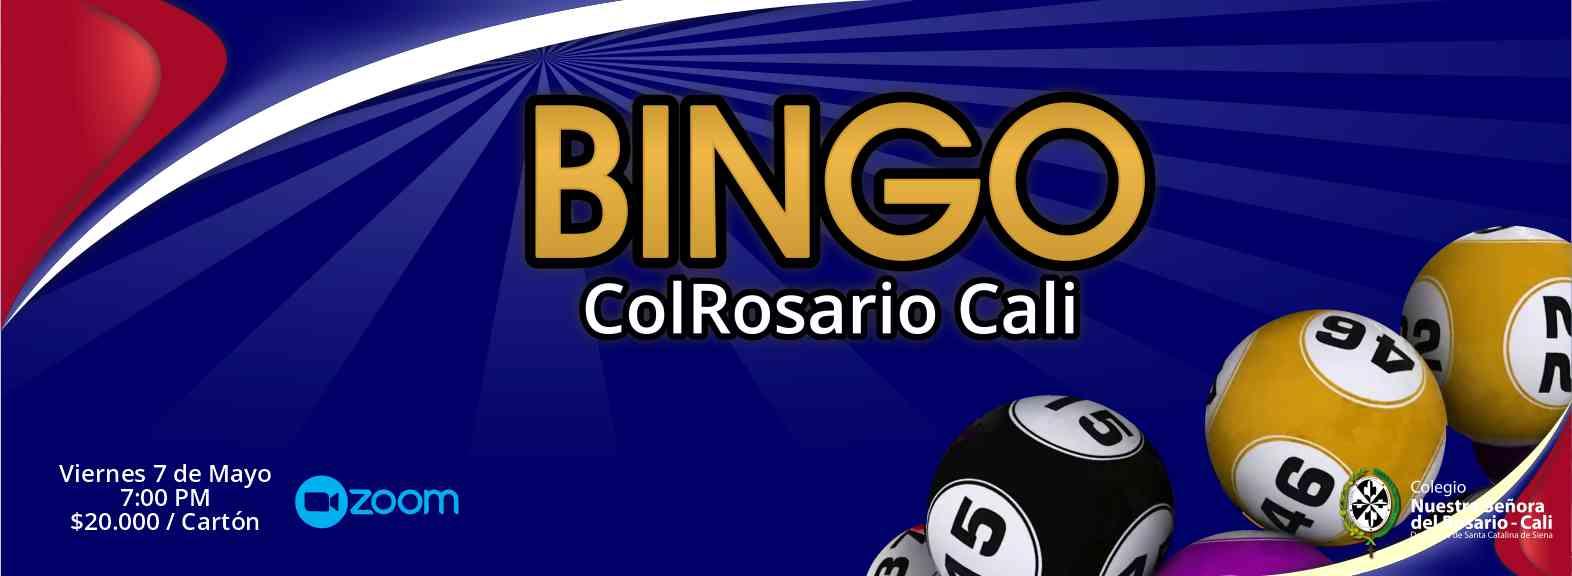 Banner Col Rosario 2105 02